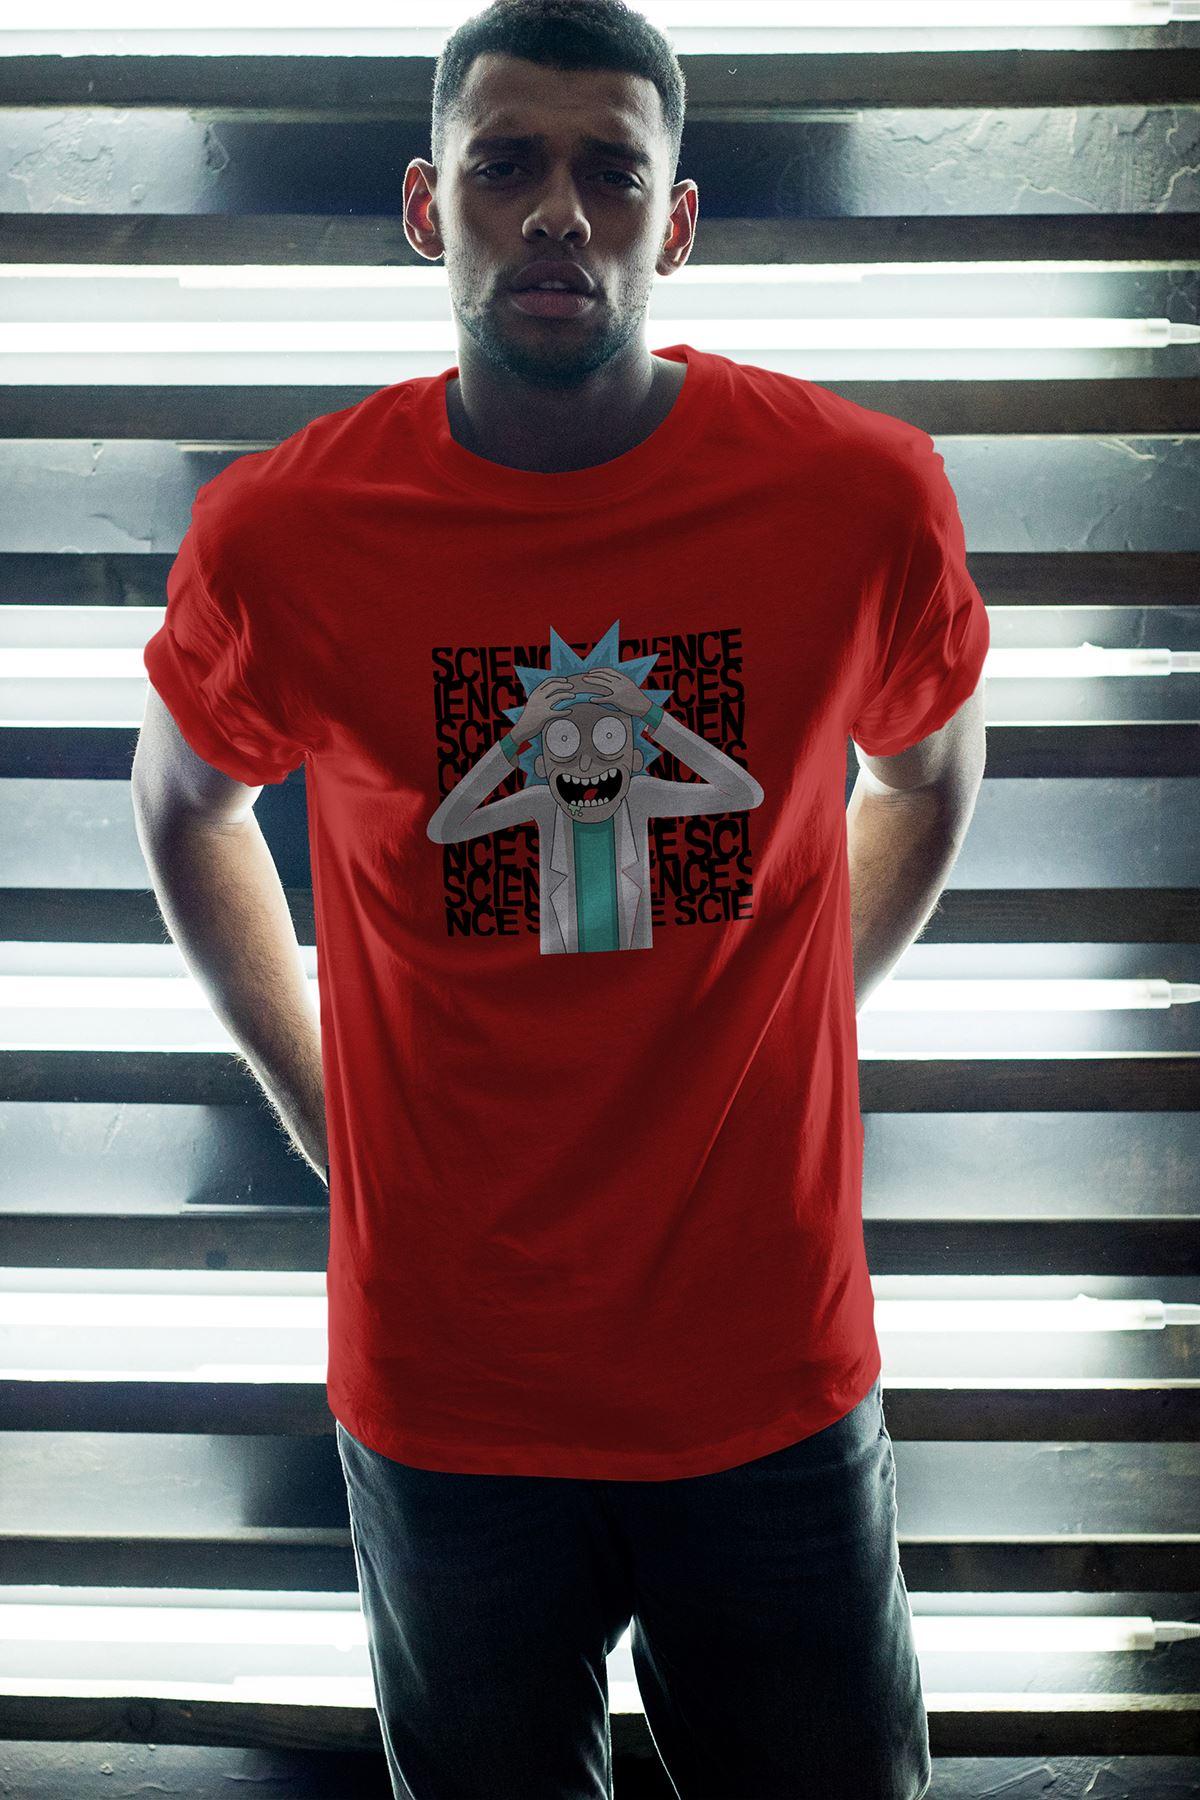 Rick and Morty 145 Kırmızı Erkek Oversize Tshirt - Tişört